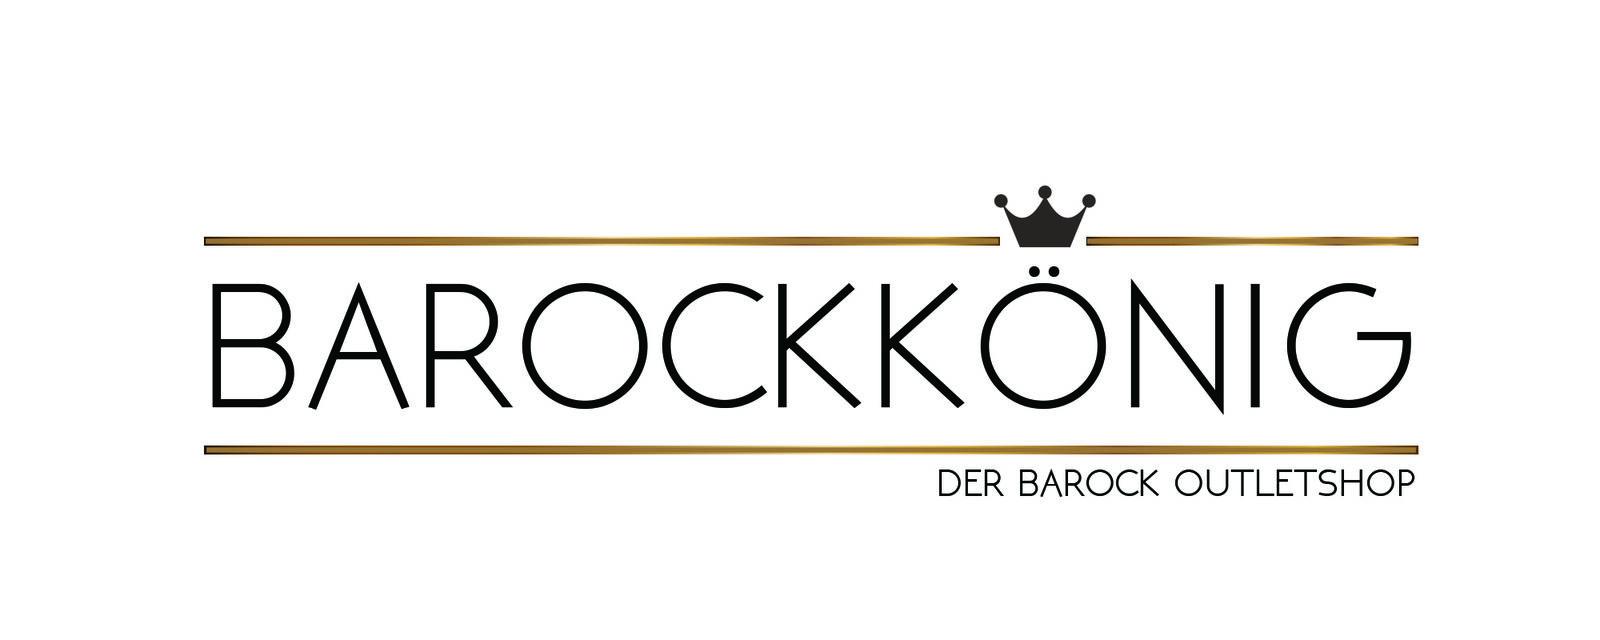 BAROCKKOENIG-DE